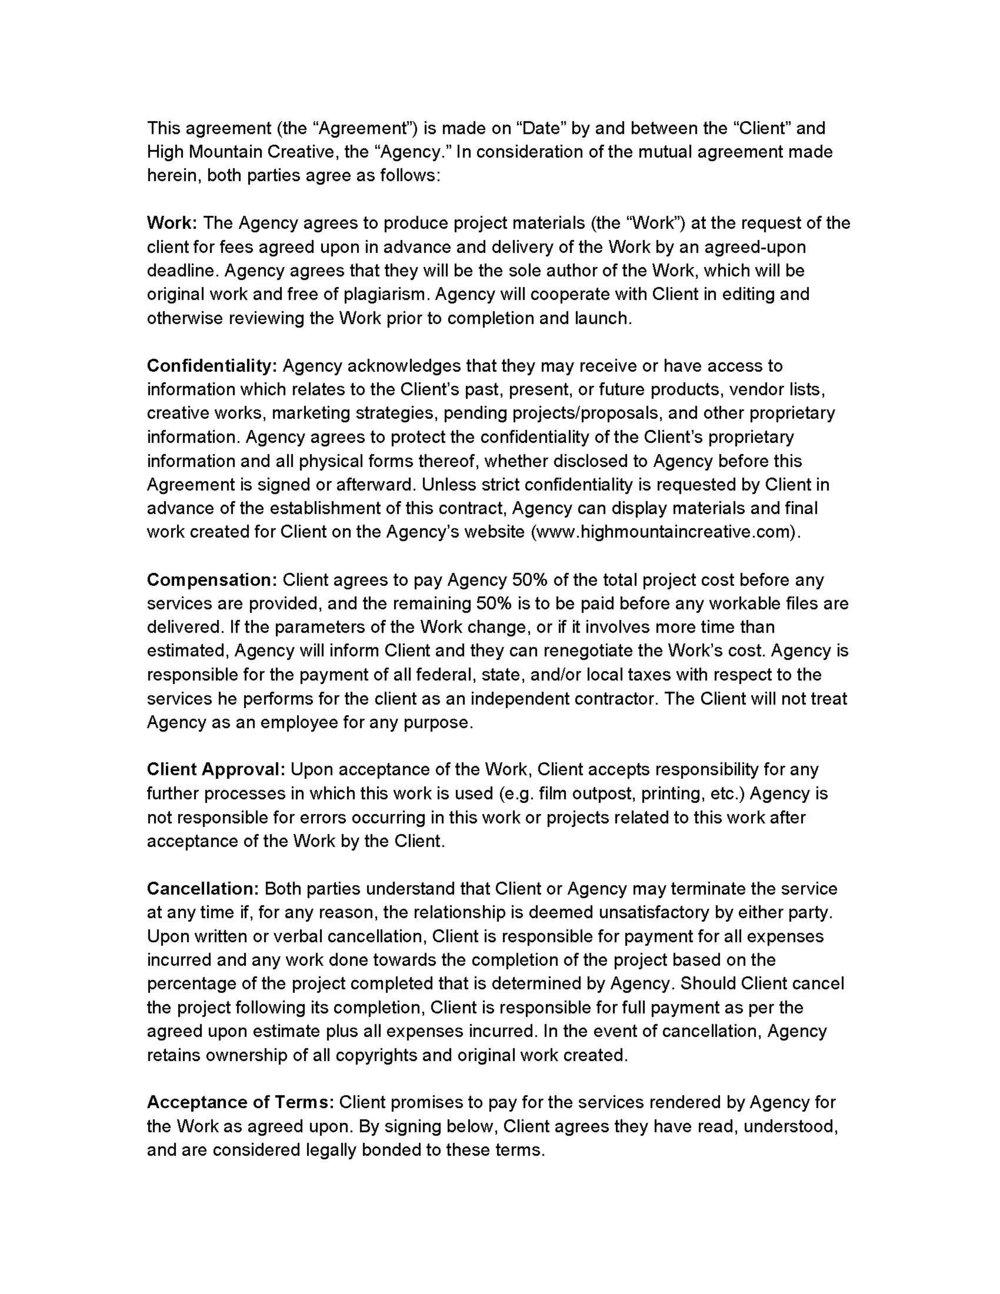 HMC Creative Services Agreement 2018.jpg